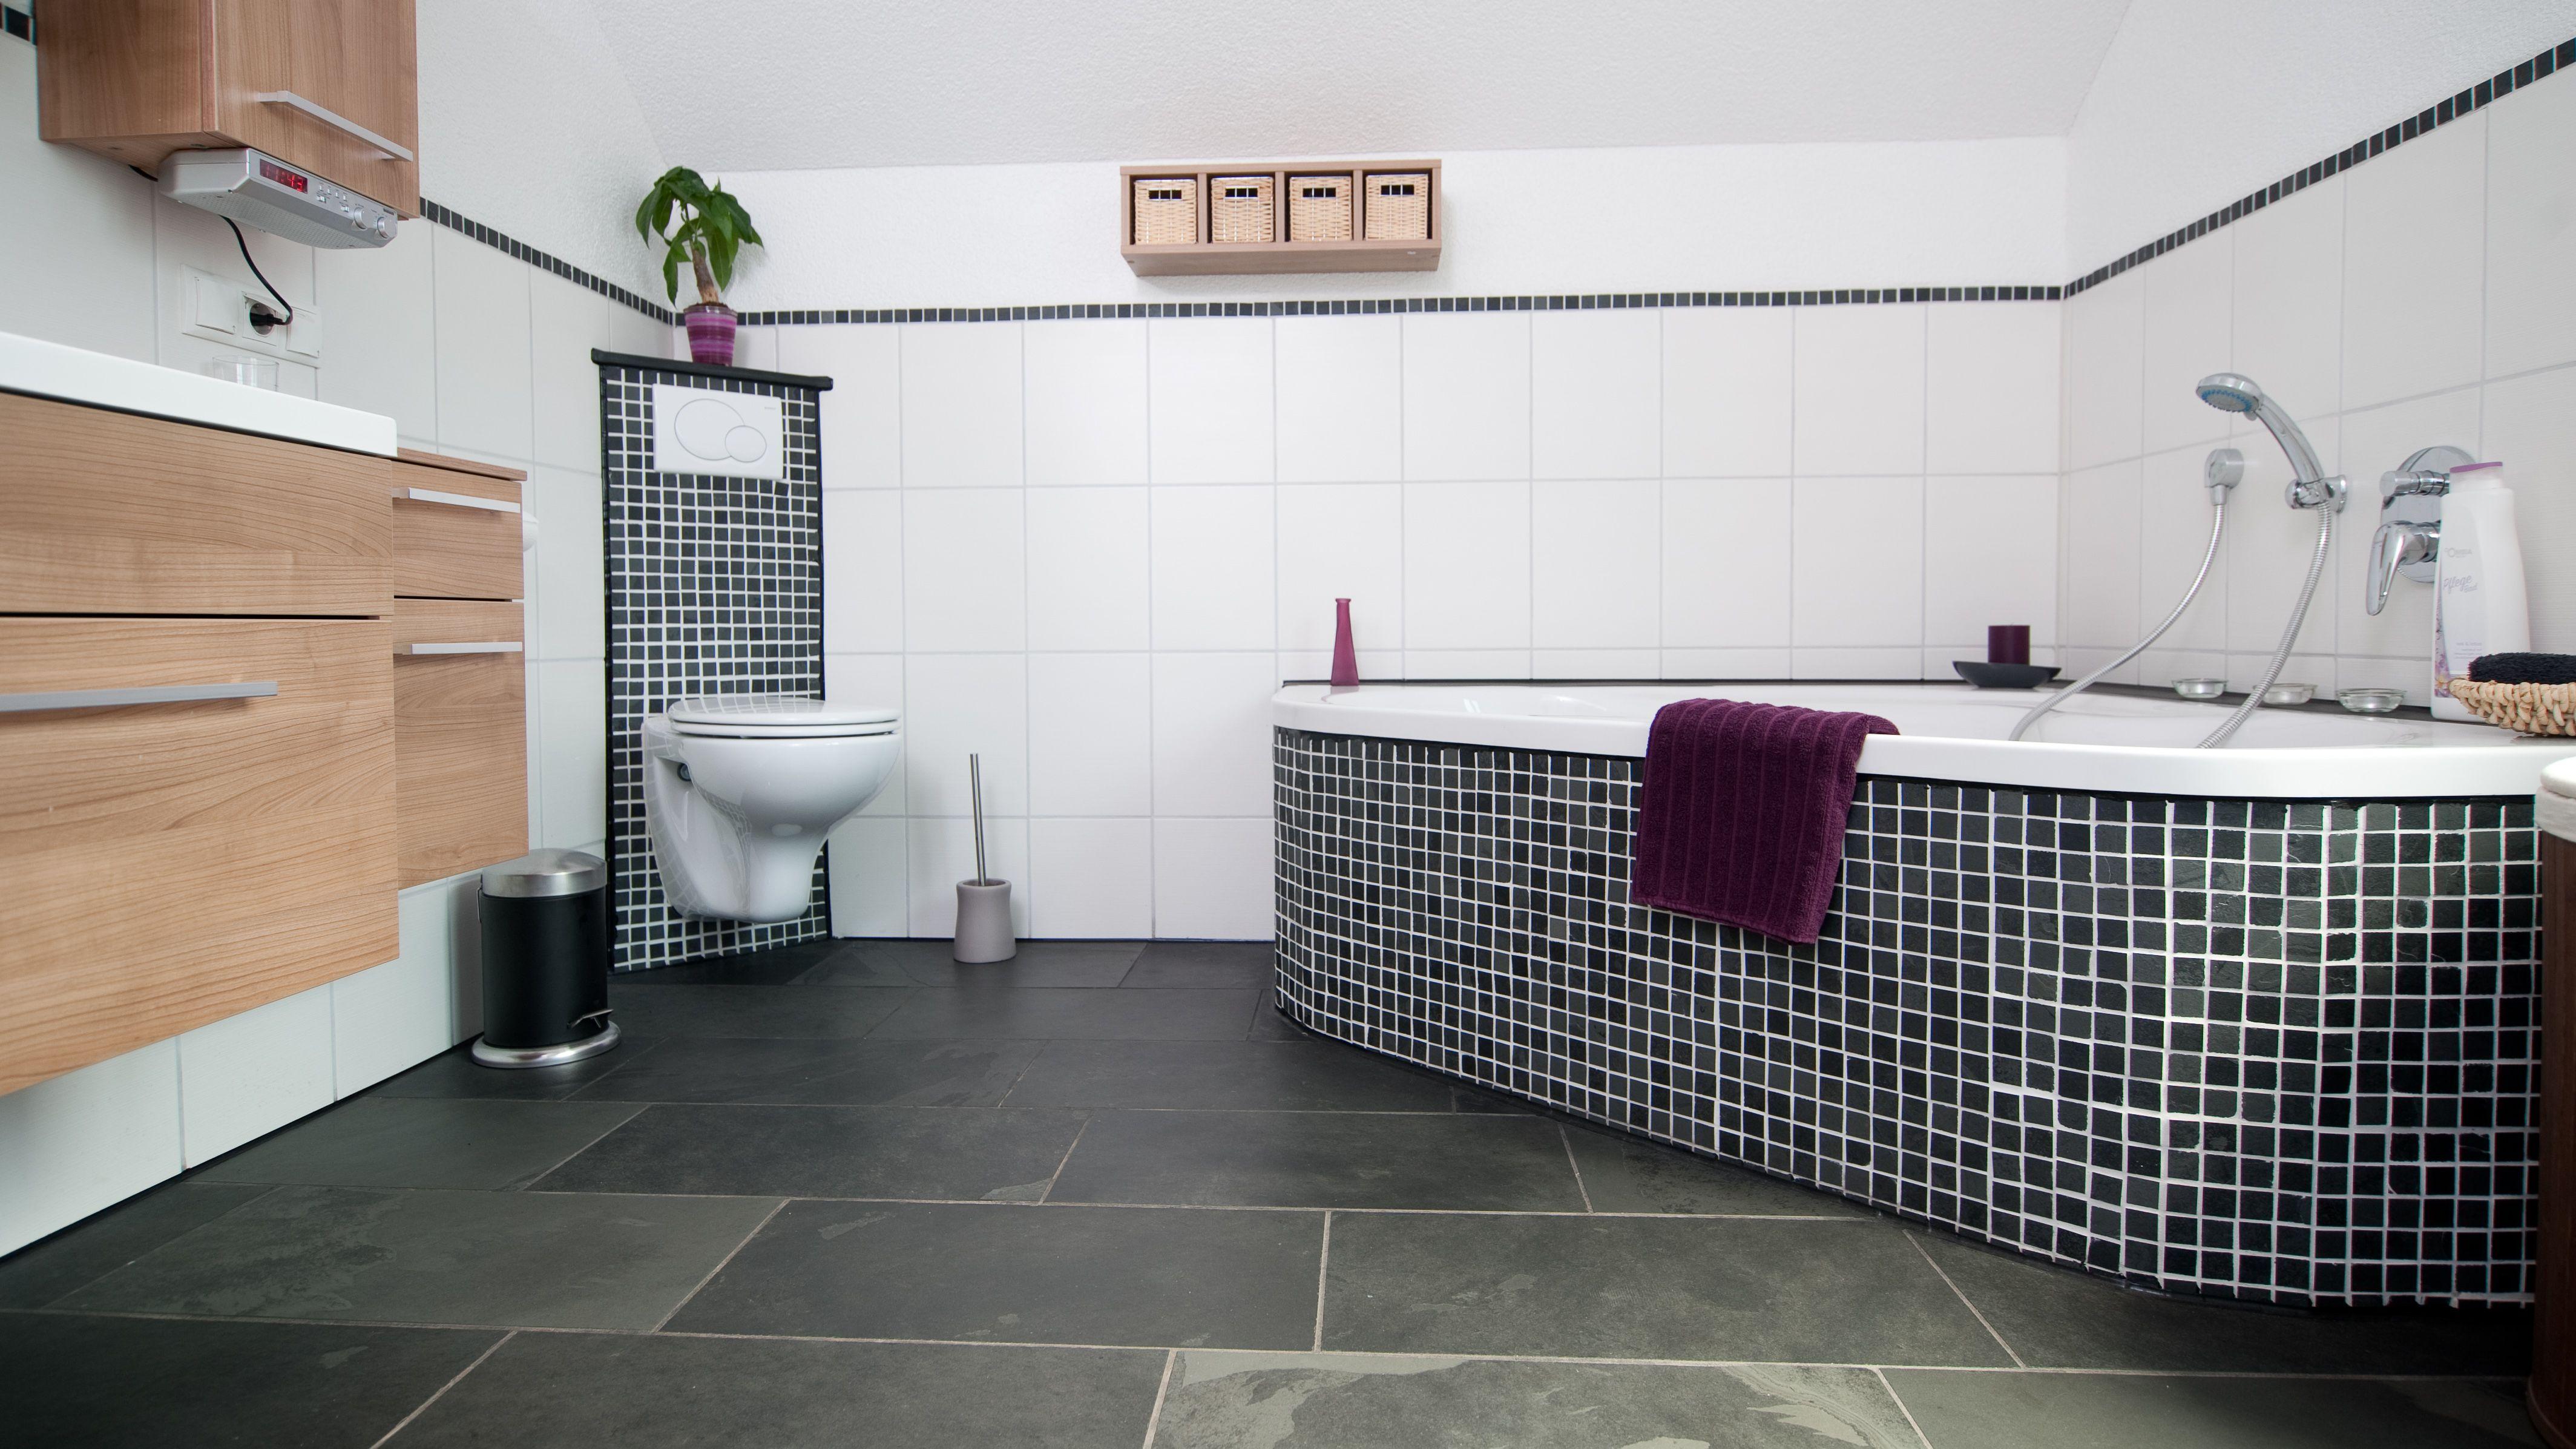 Badezimmer Fliesen Mosaik Grau Brilliant Badezimmer Fliesen Mosaik